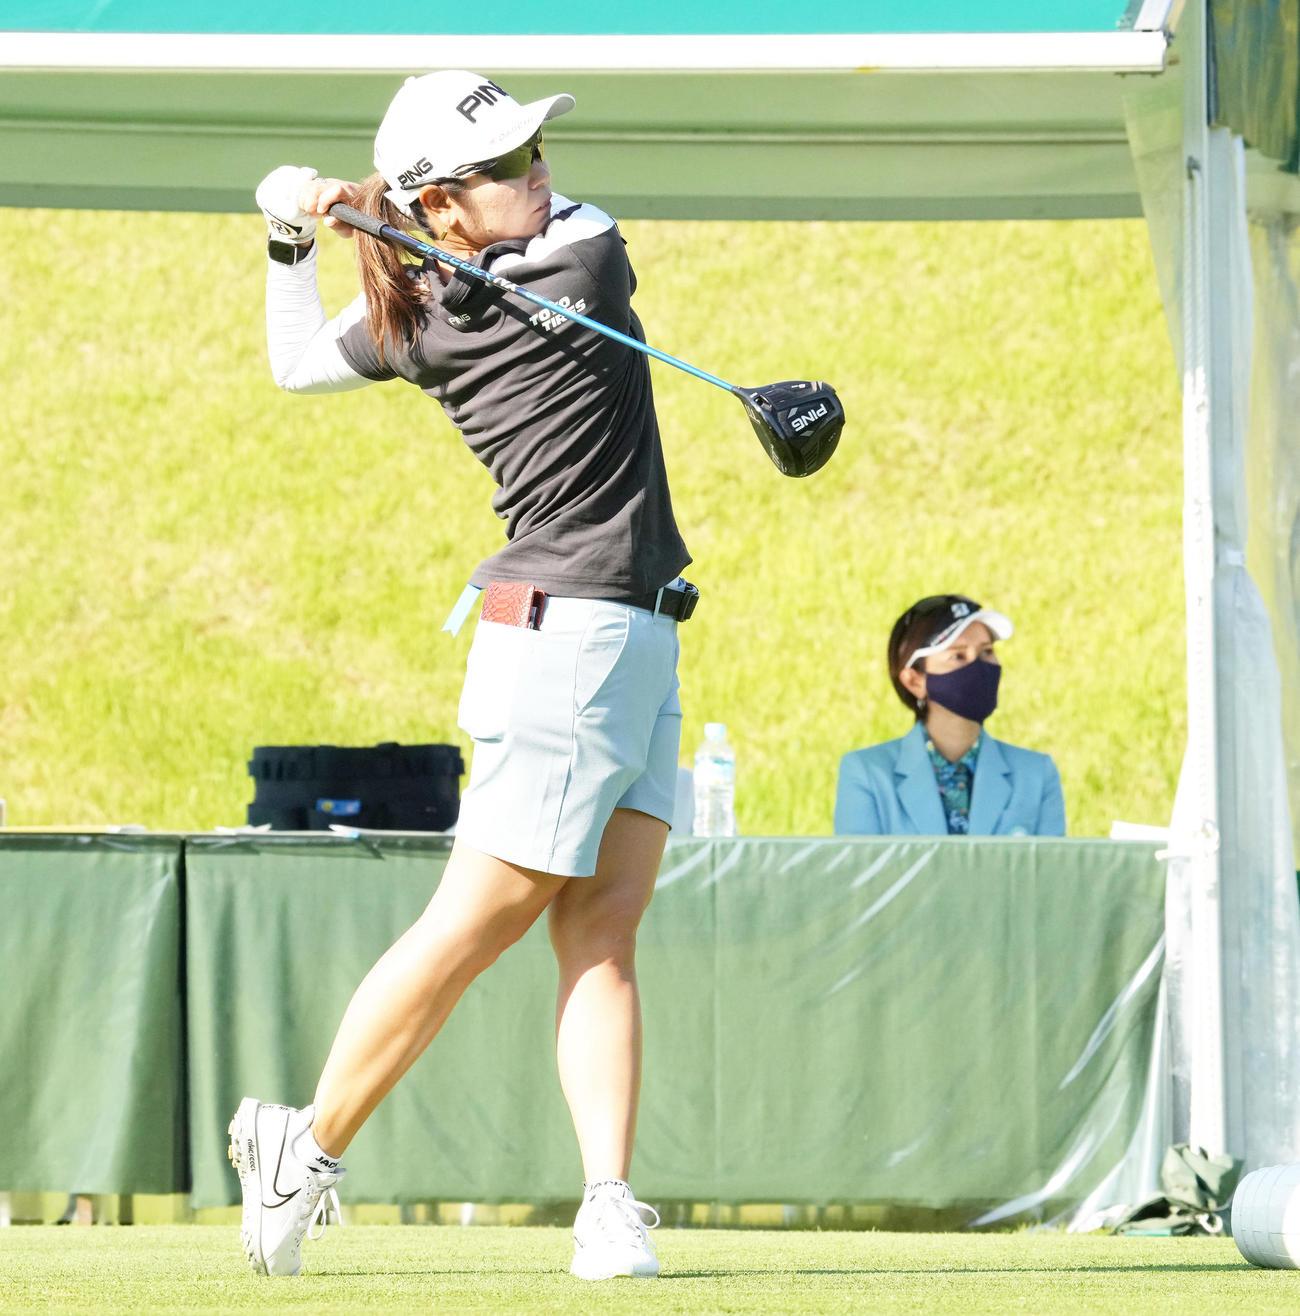 https://www.nikkansports.com/sports/golf/news/img/202106100000032-w1300_1.jpg